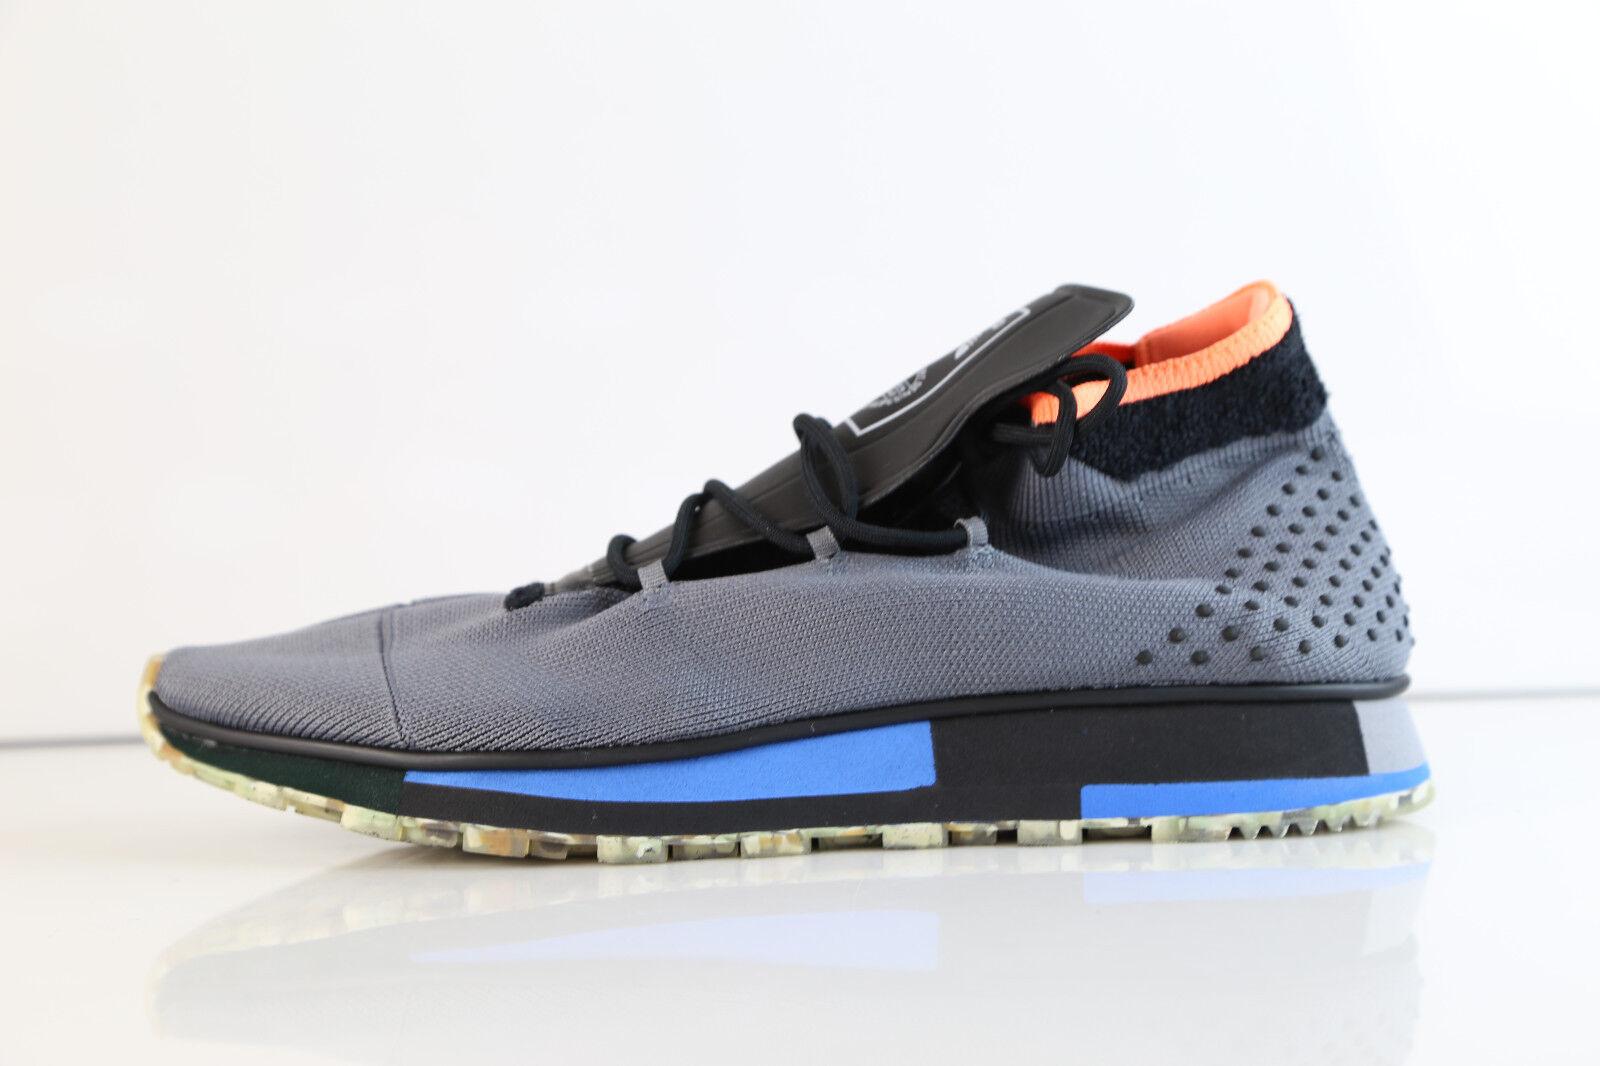 Adidas - alexander wang - Adidas corri met grey blue ac6844 gli 8 e i 13 a pk il primo sentiero 159a9e